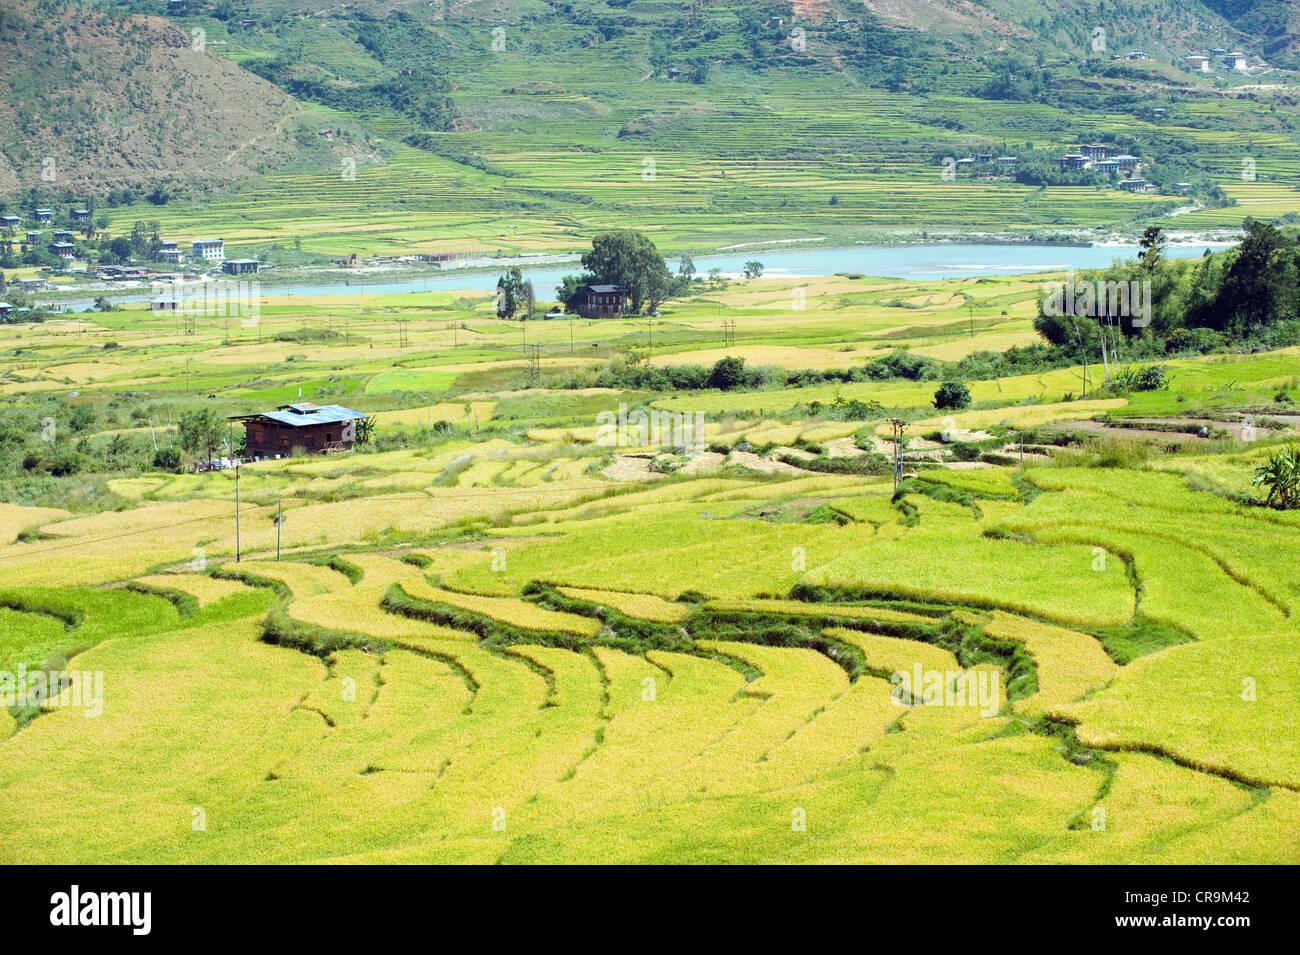 rices fields, Bhutan, Asia - Stock Image